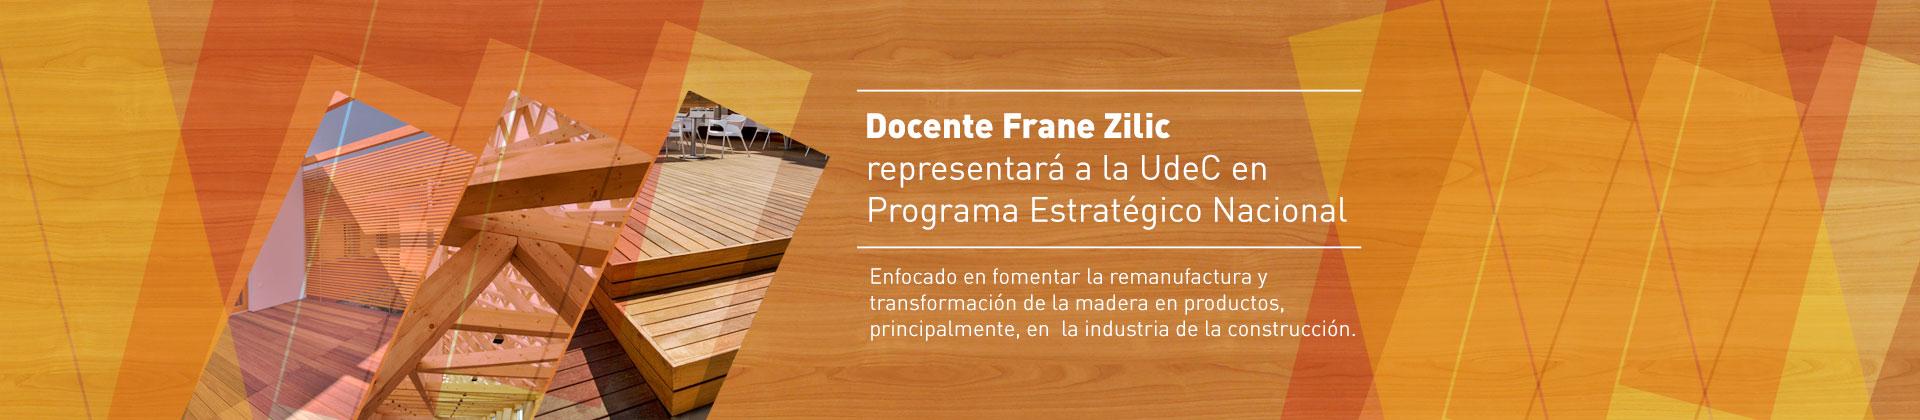 frane-zilic-programa-estartegico1